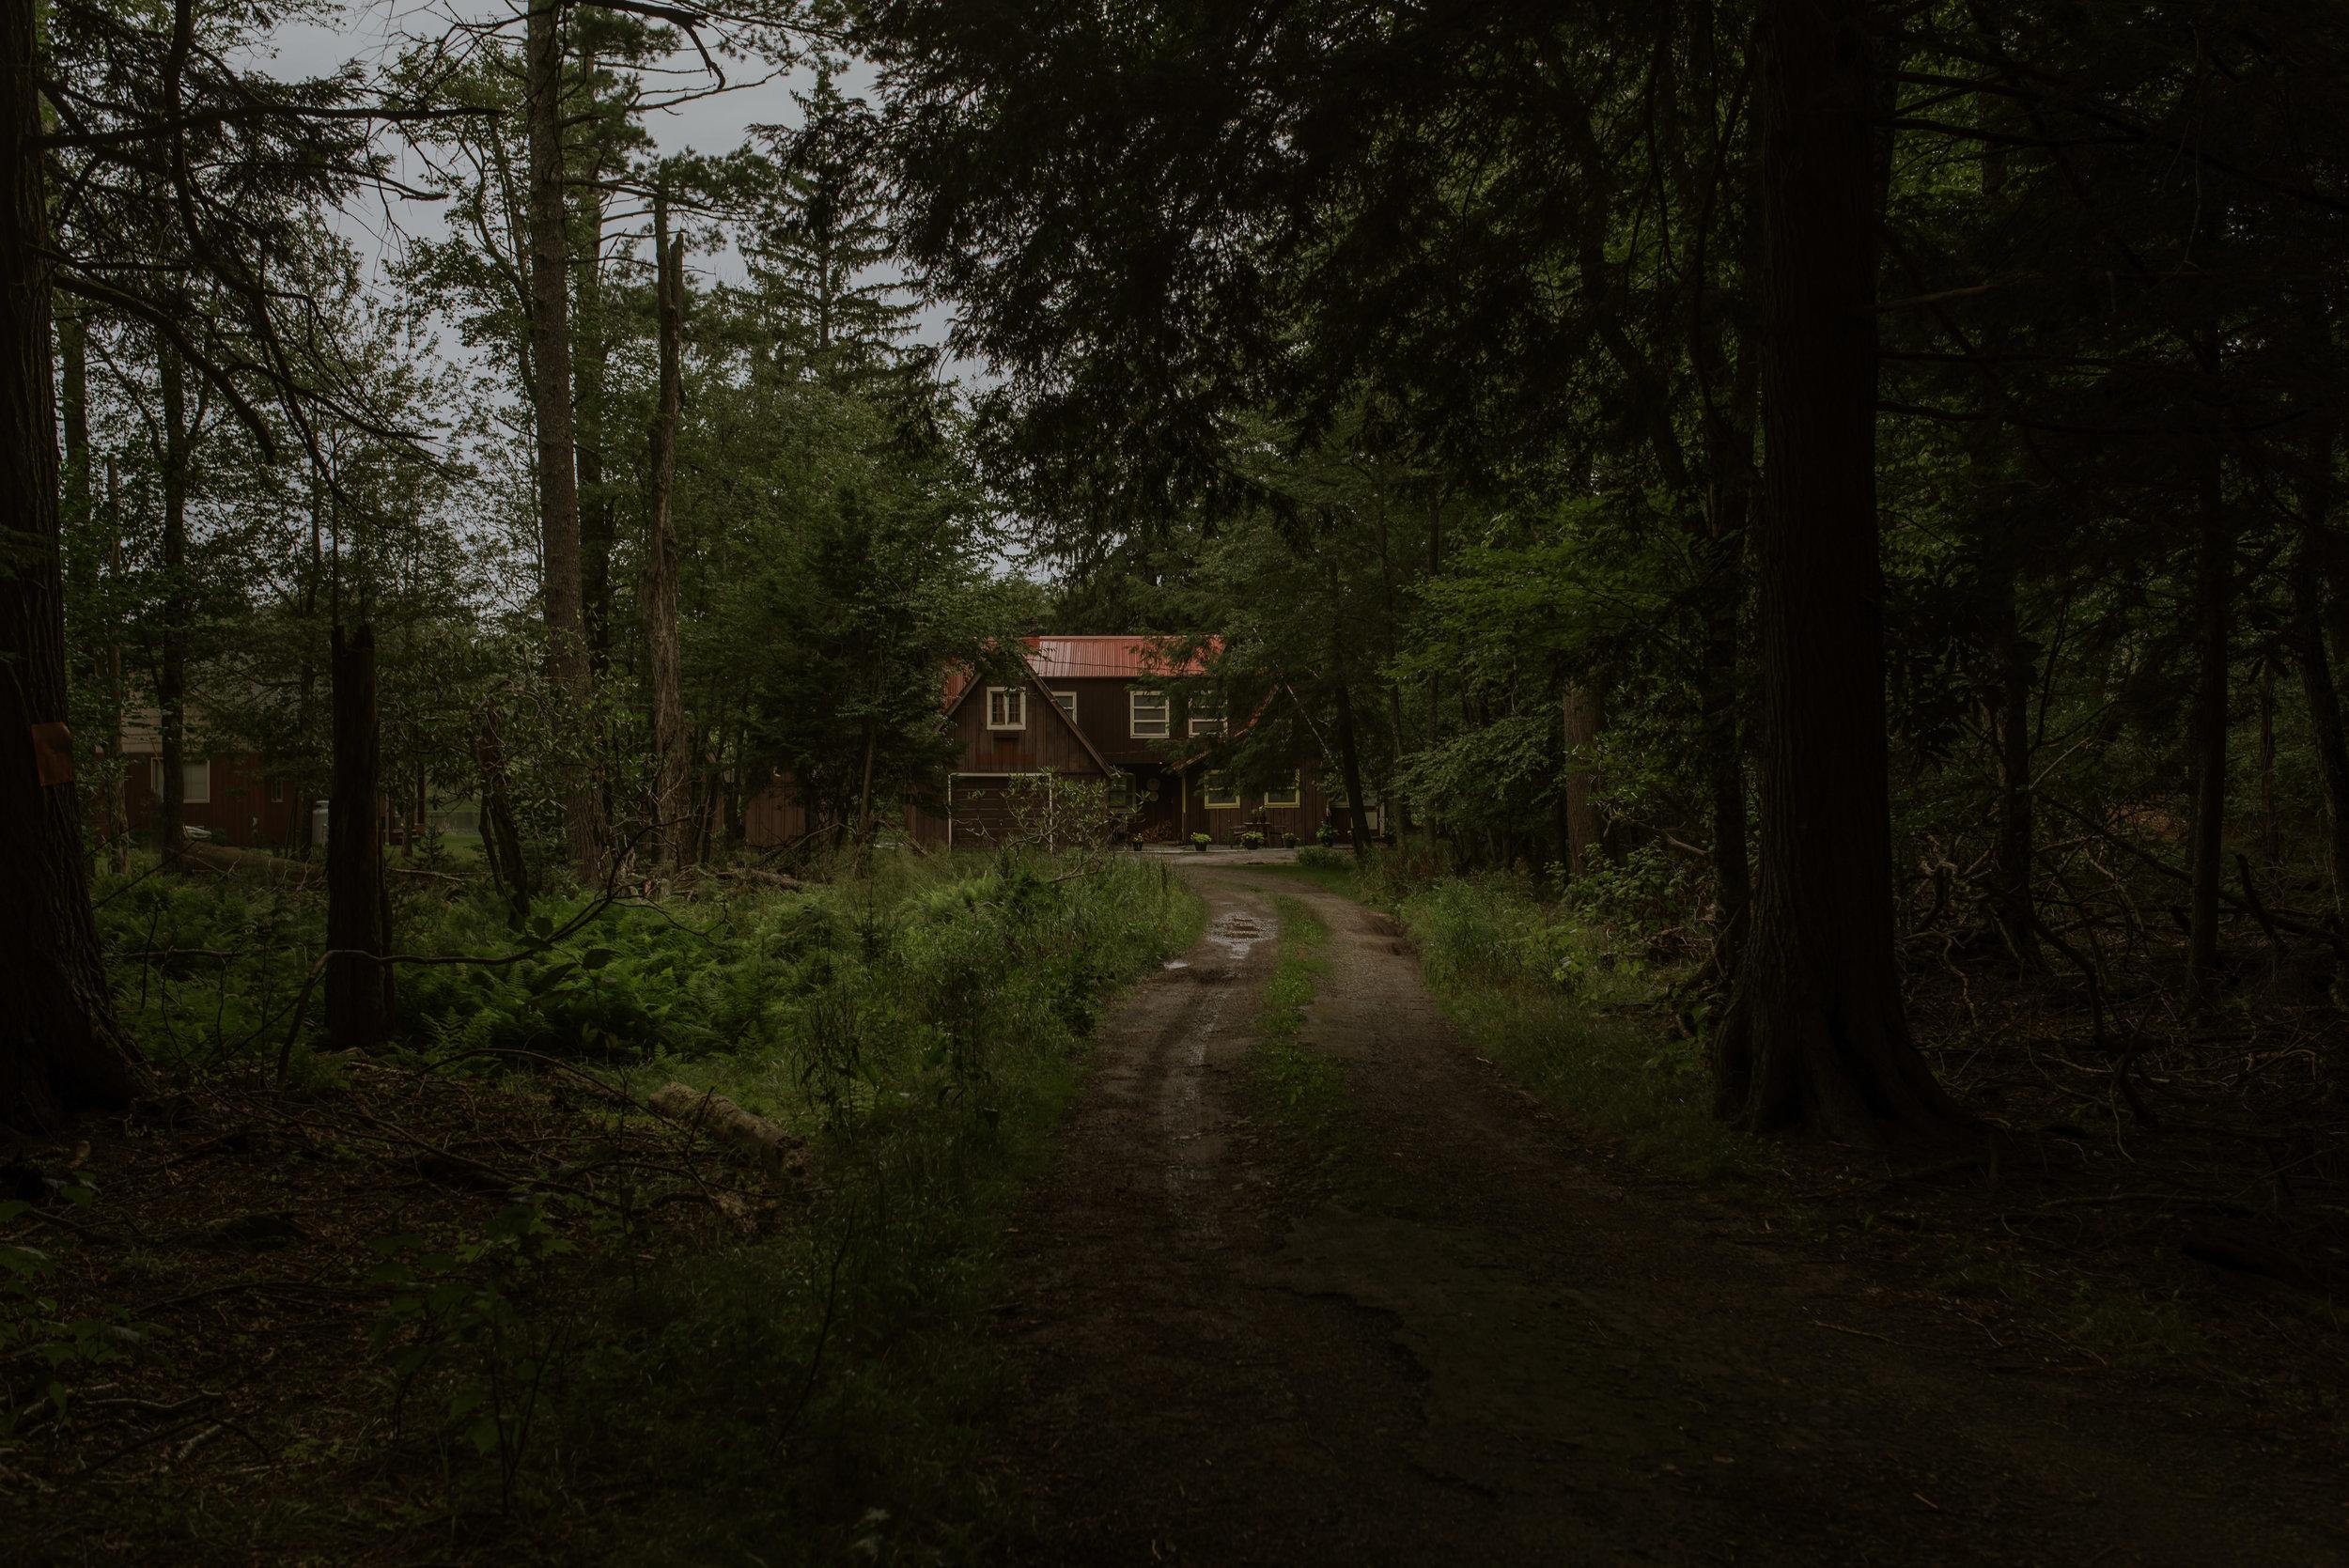 arnold-house-summer-Lawrence-Braun-Lake-House-0014arnold-house-summer-Lawrence-Braun-Lake-House-0014arnold-house-summer-Lawrence-Braun-Lake-House-0014arnold-house-summer-Lawrence-Braun-Lake-House-0014.jpg